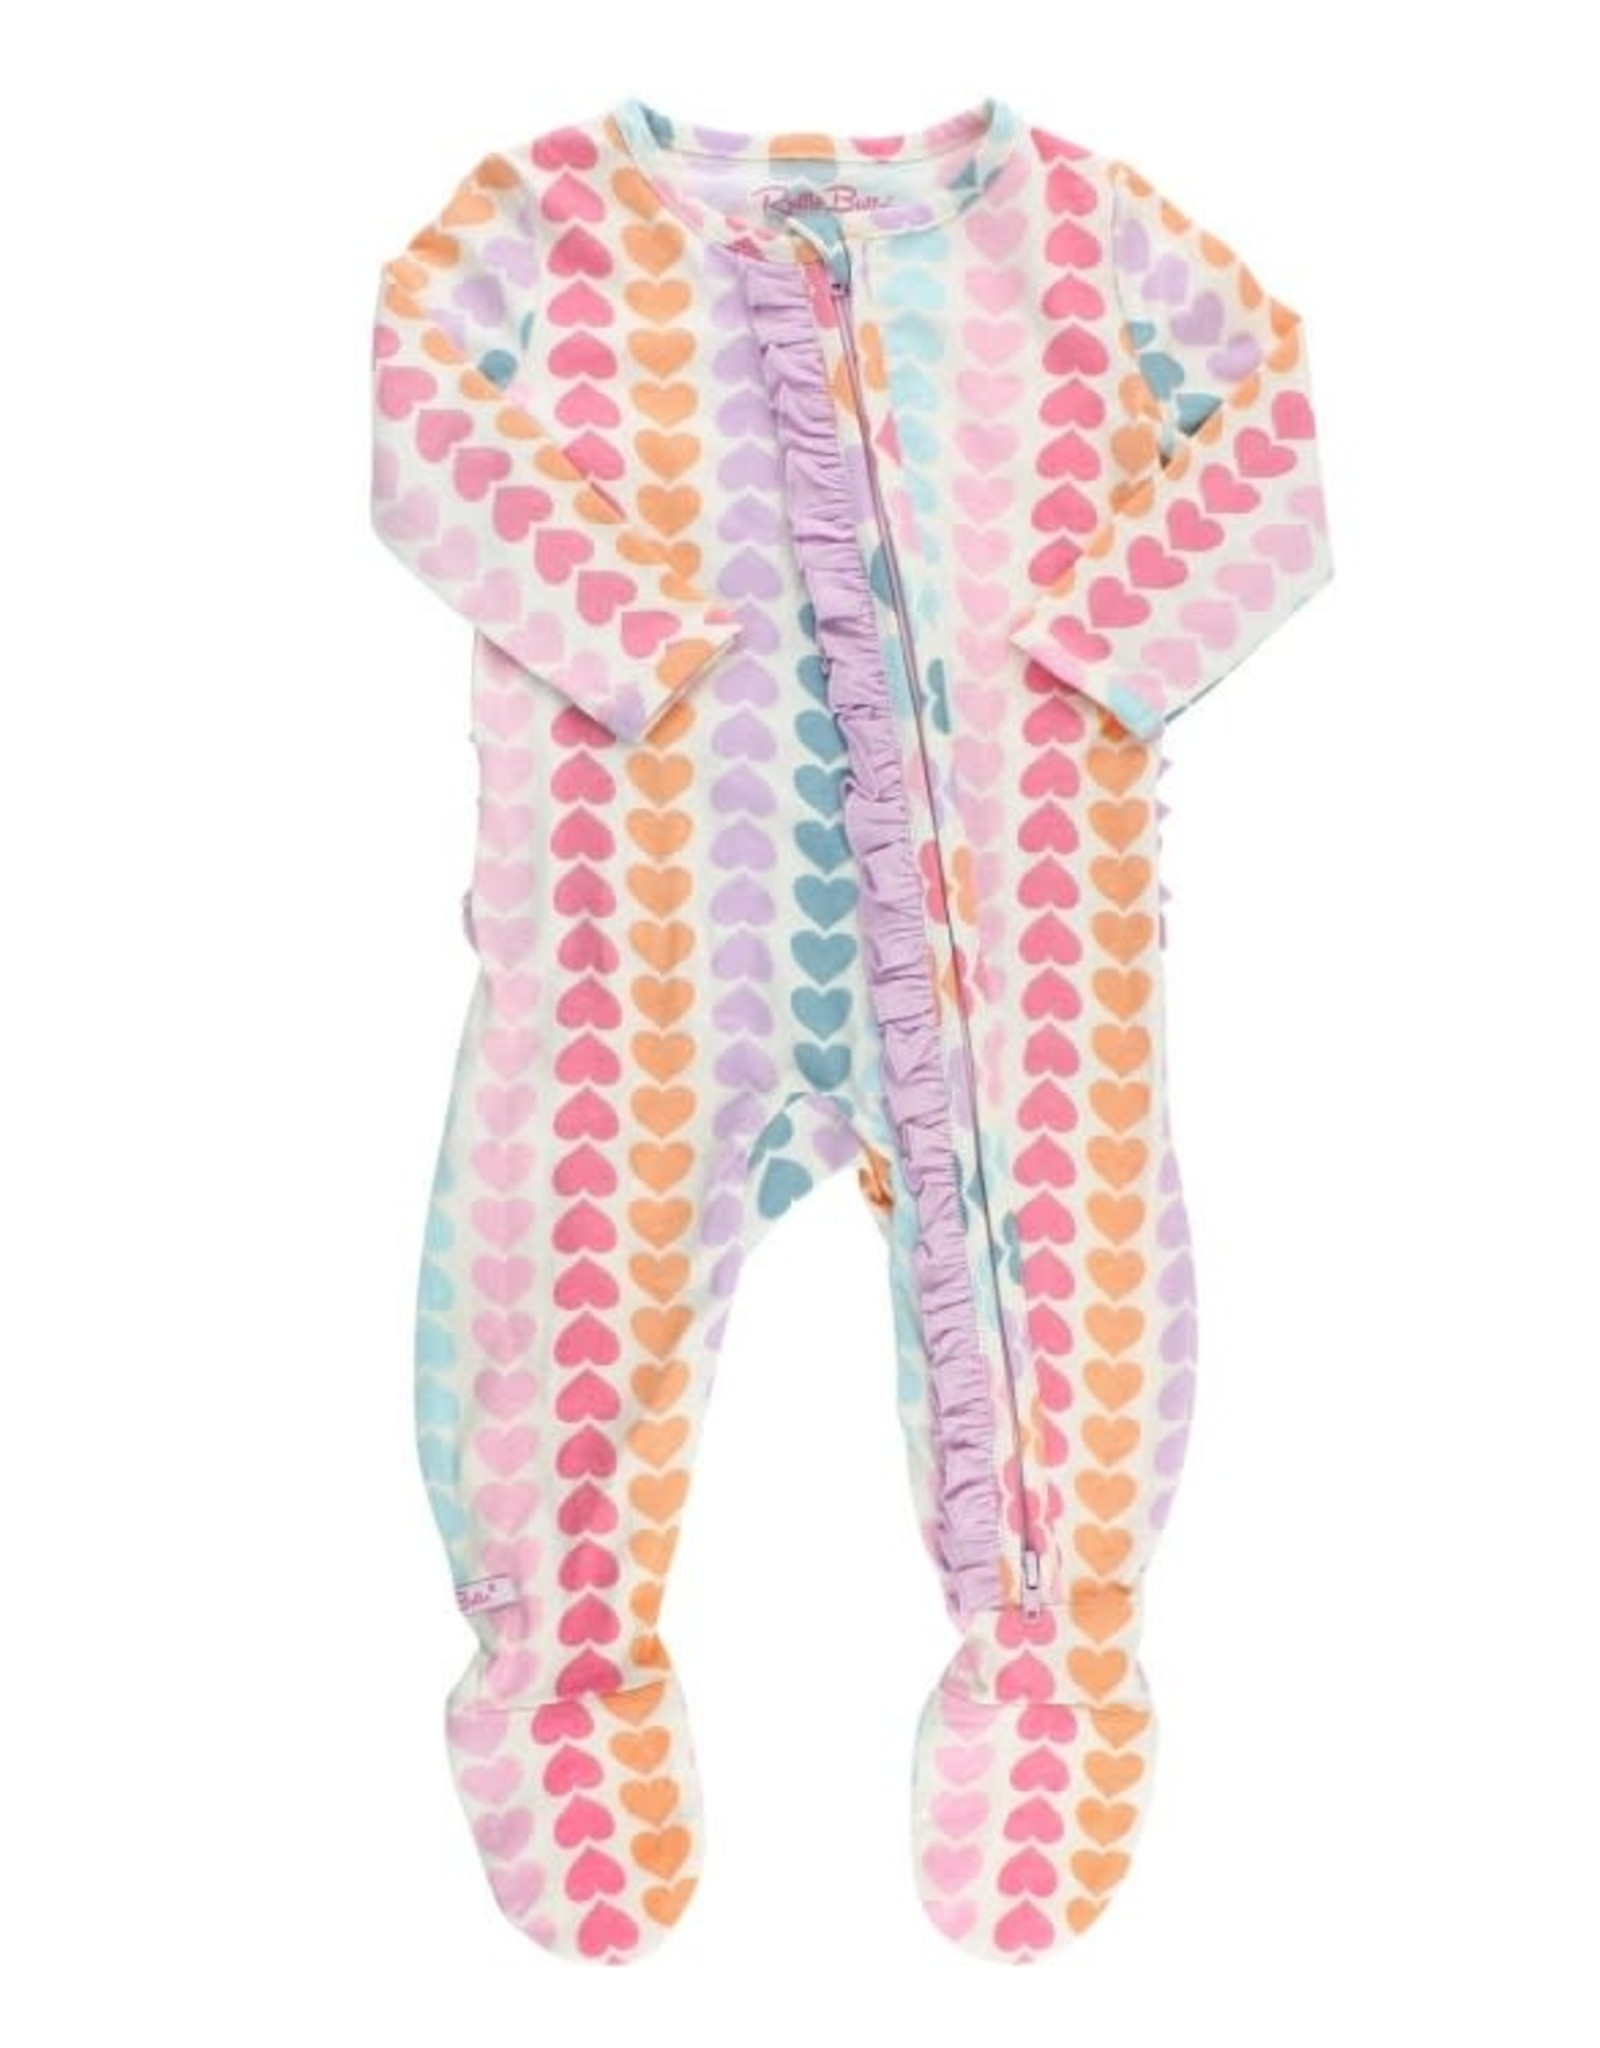 RuffleButts Rainbow Hearts Snuggly Ruffled Footed Pajamas